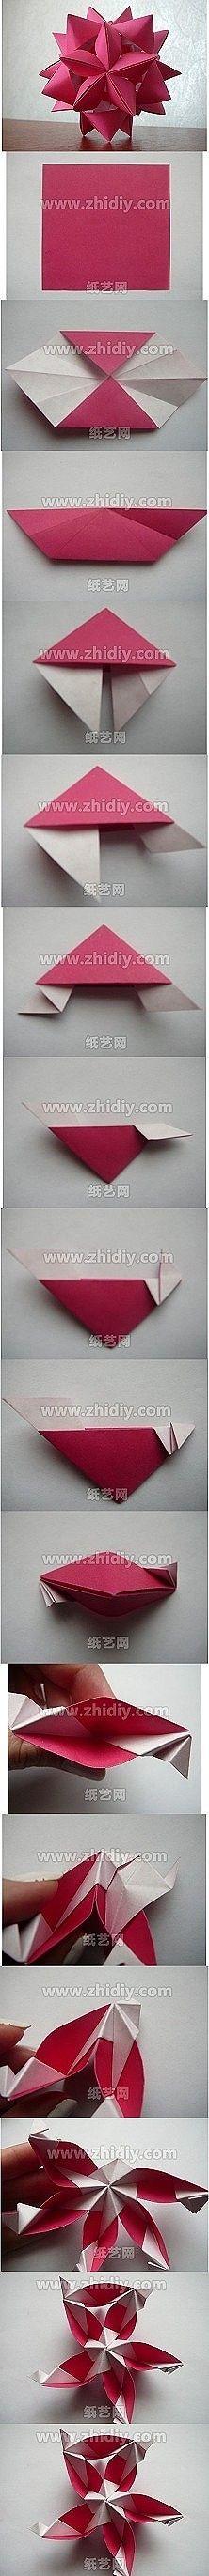 modular origami, kusudama variation